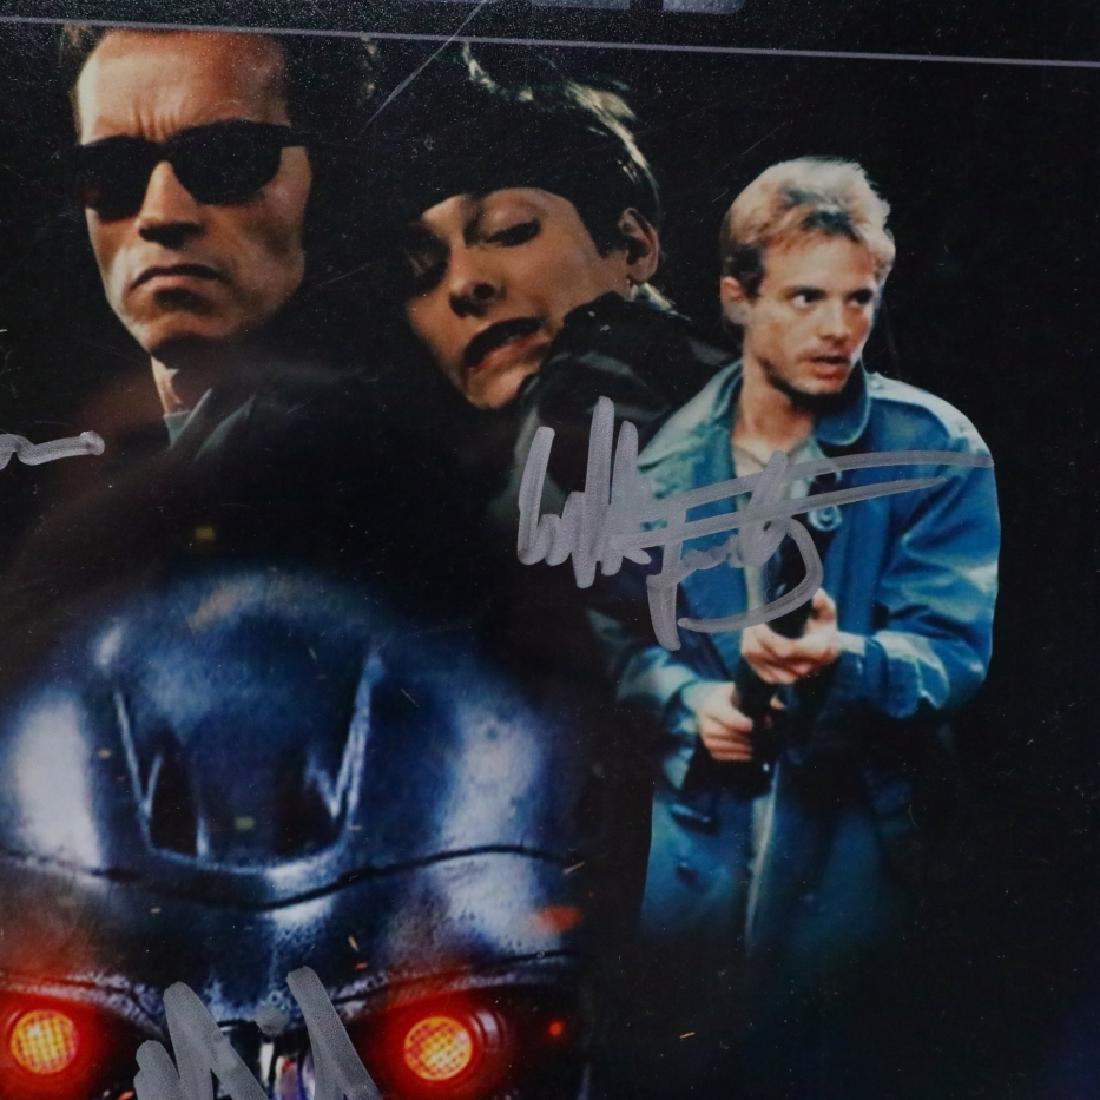 The Terminator Cast Signed Photograph W/COA - 4